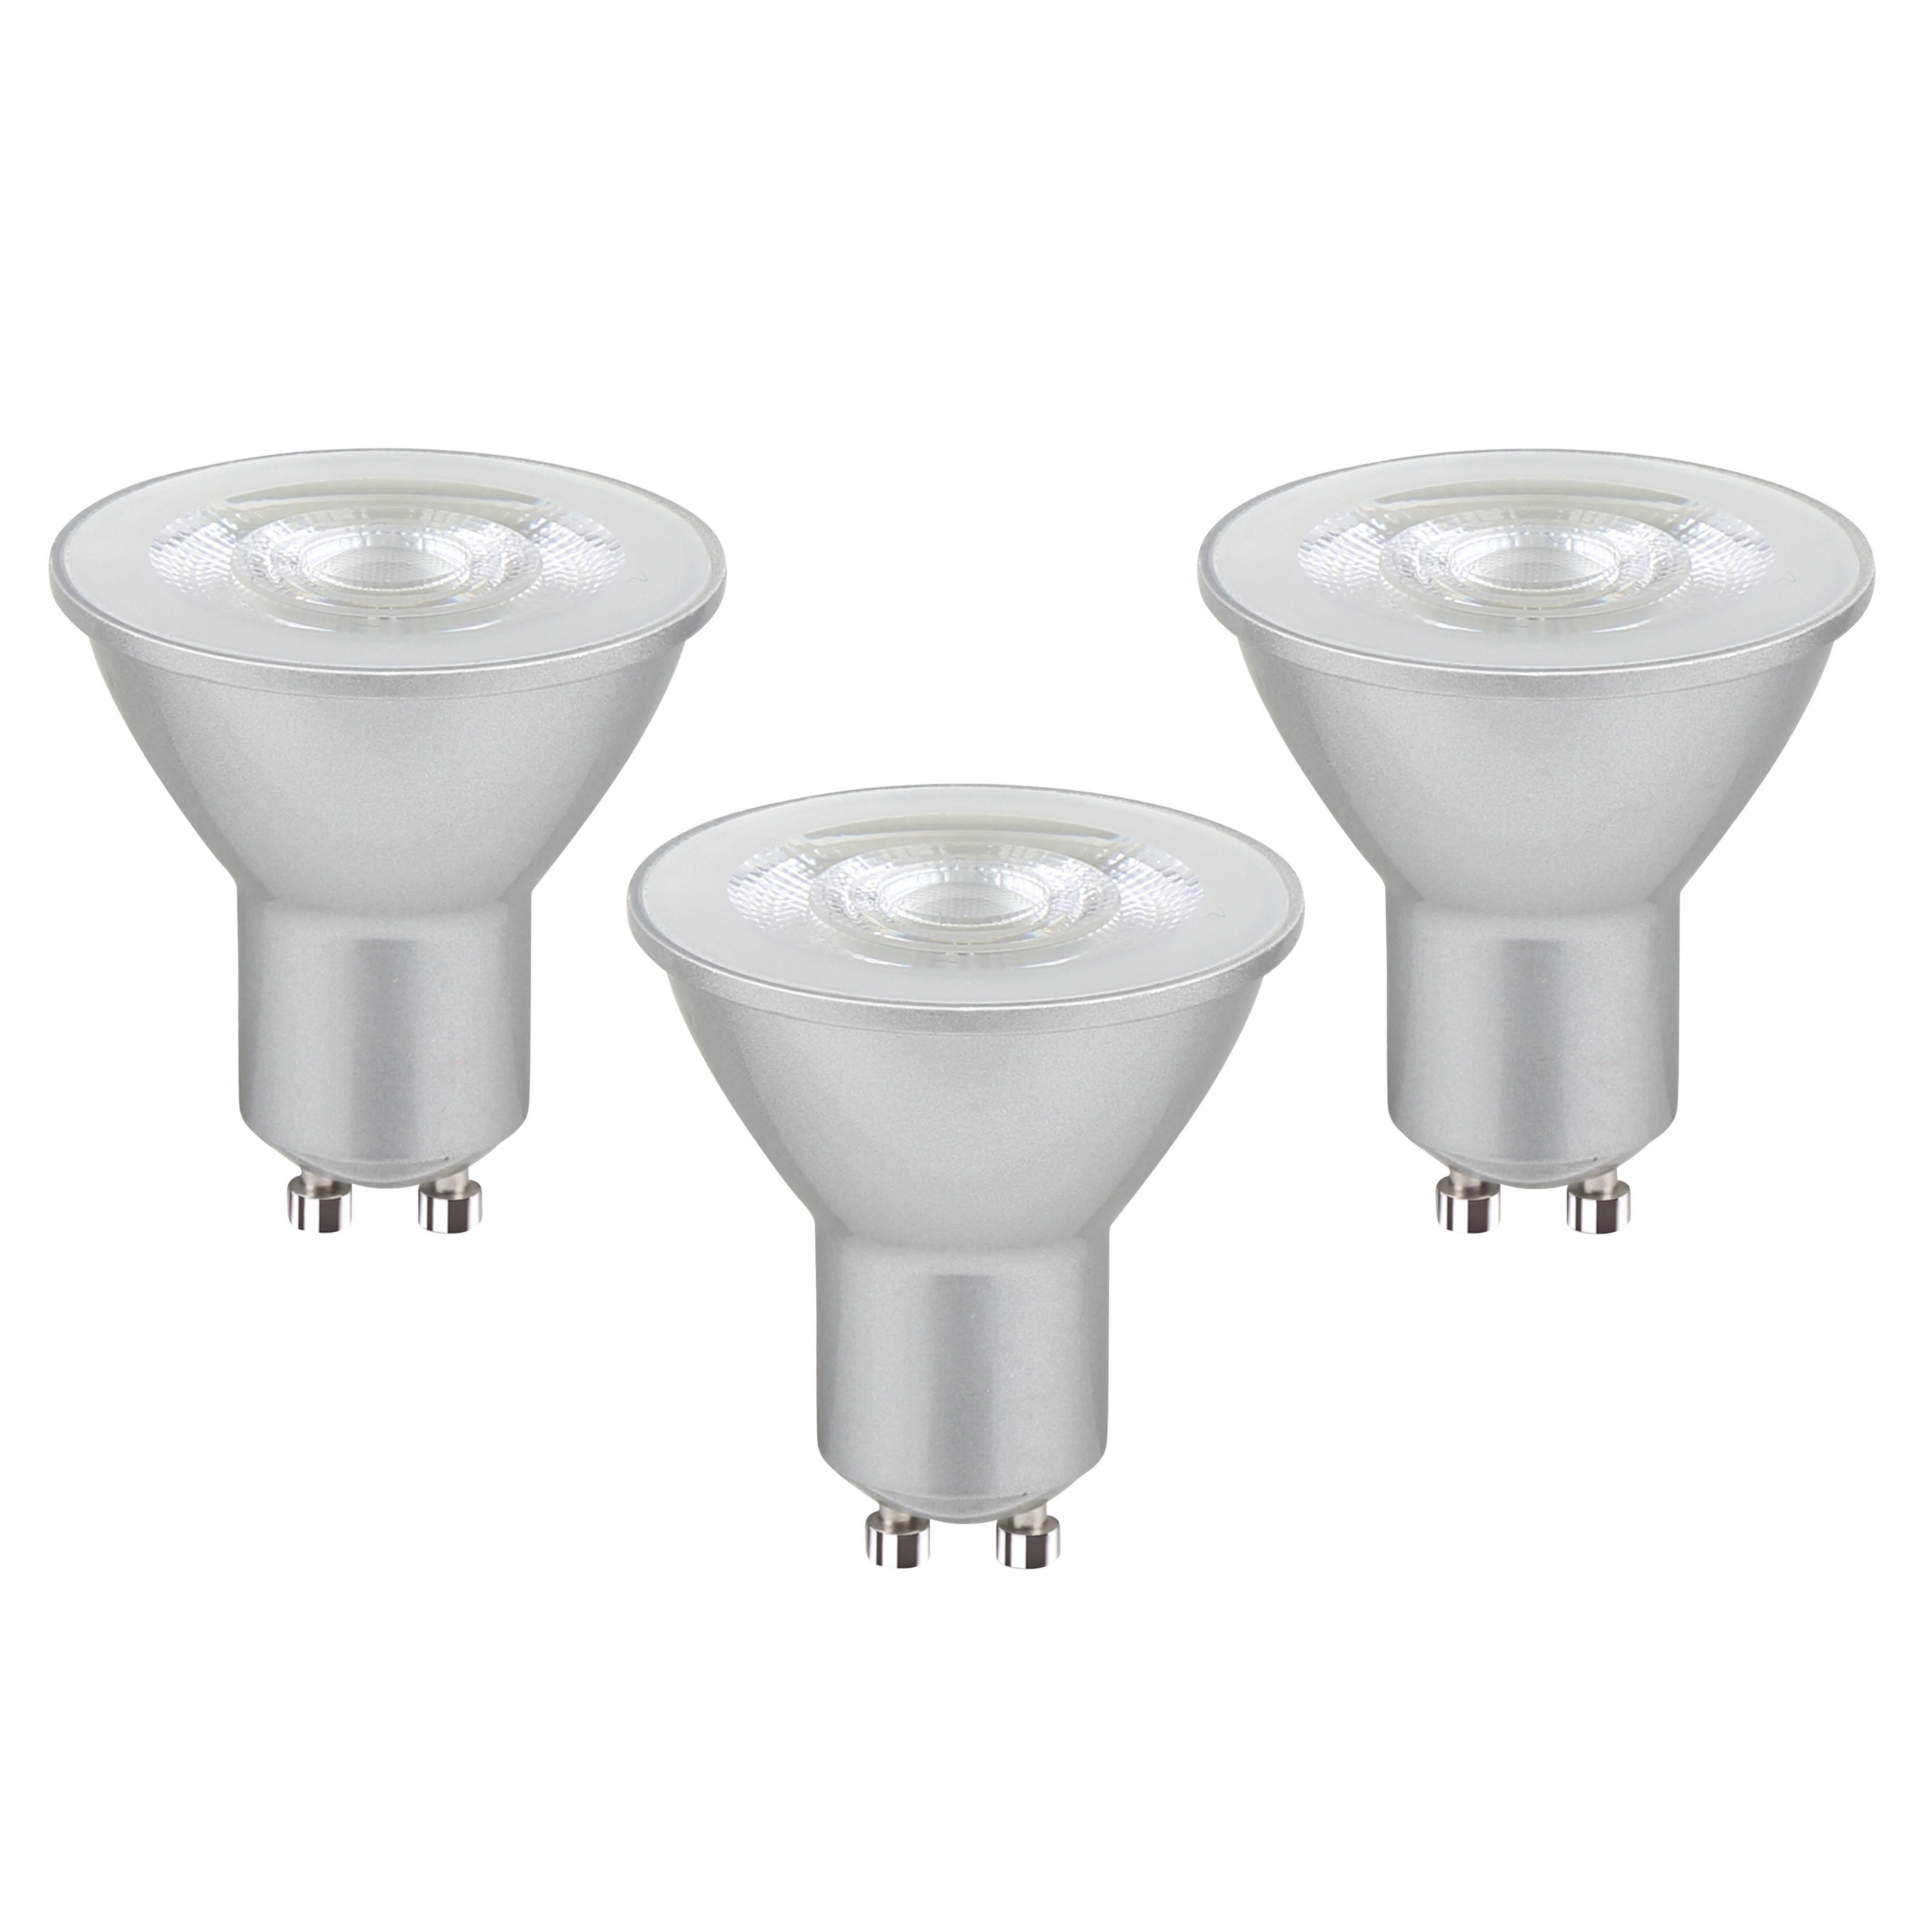 diall led reflector bulb diy. Black Bedroom Furniture Sets. Home Design Ideas